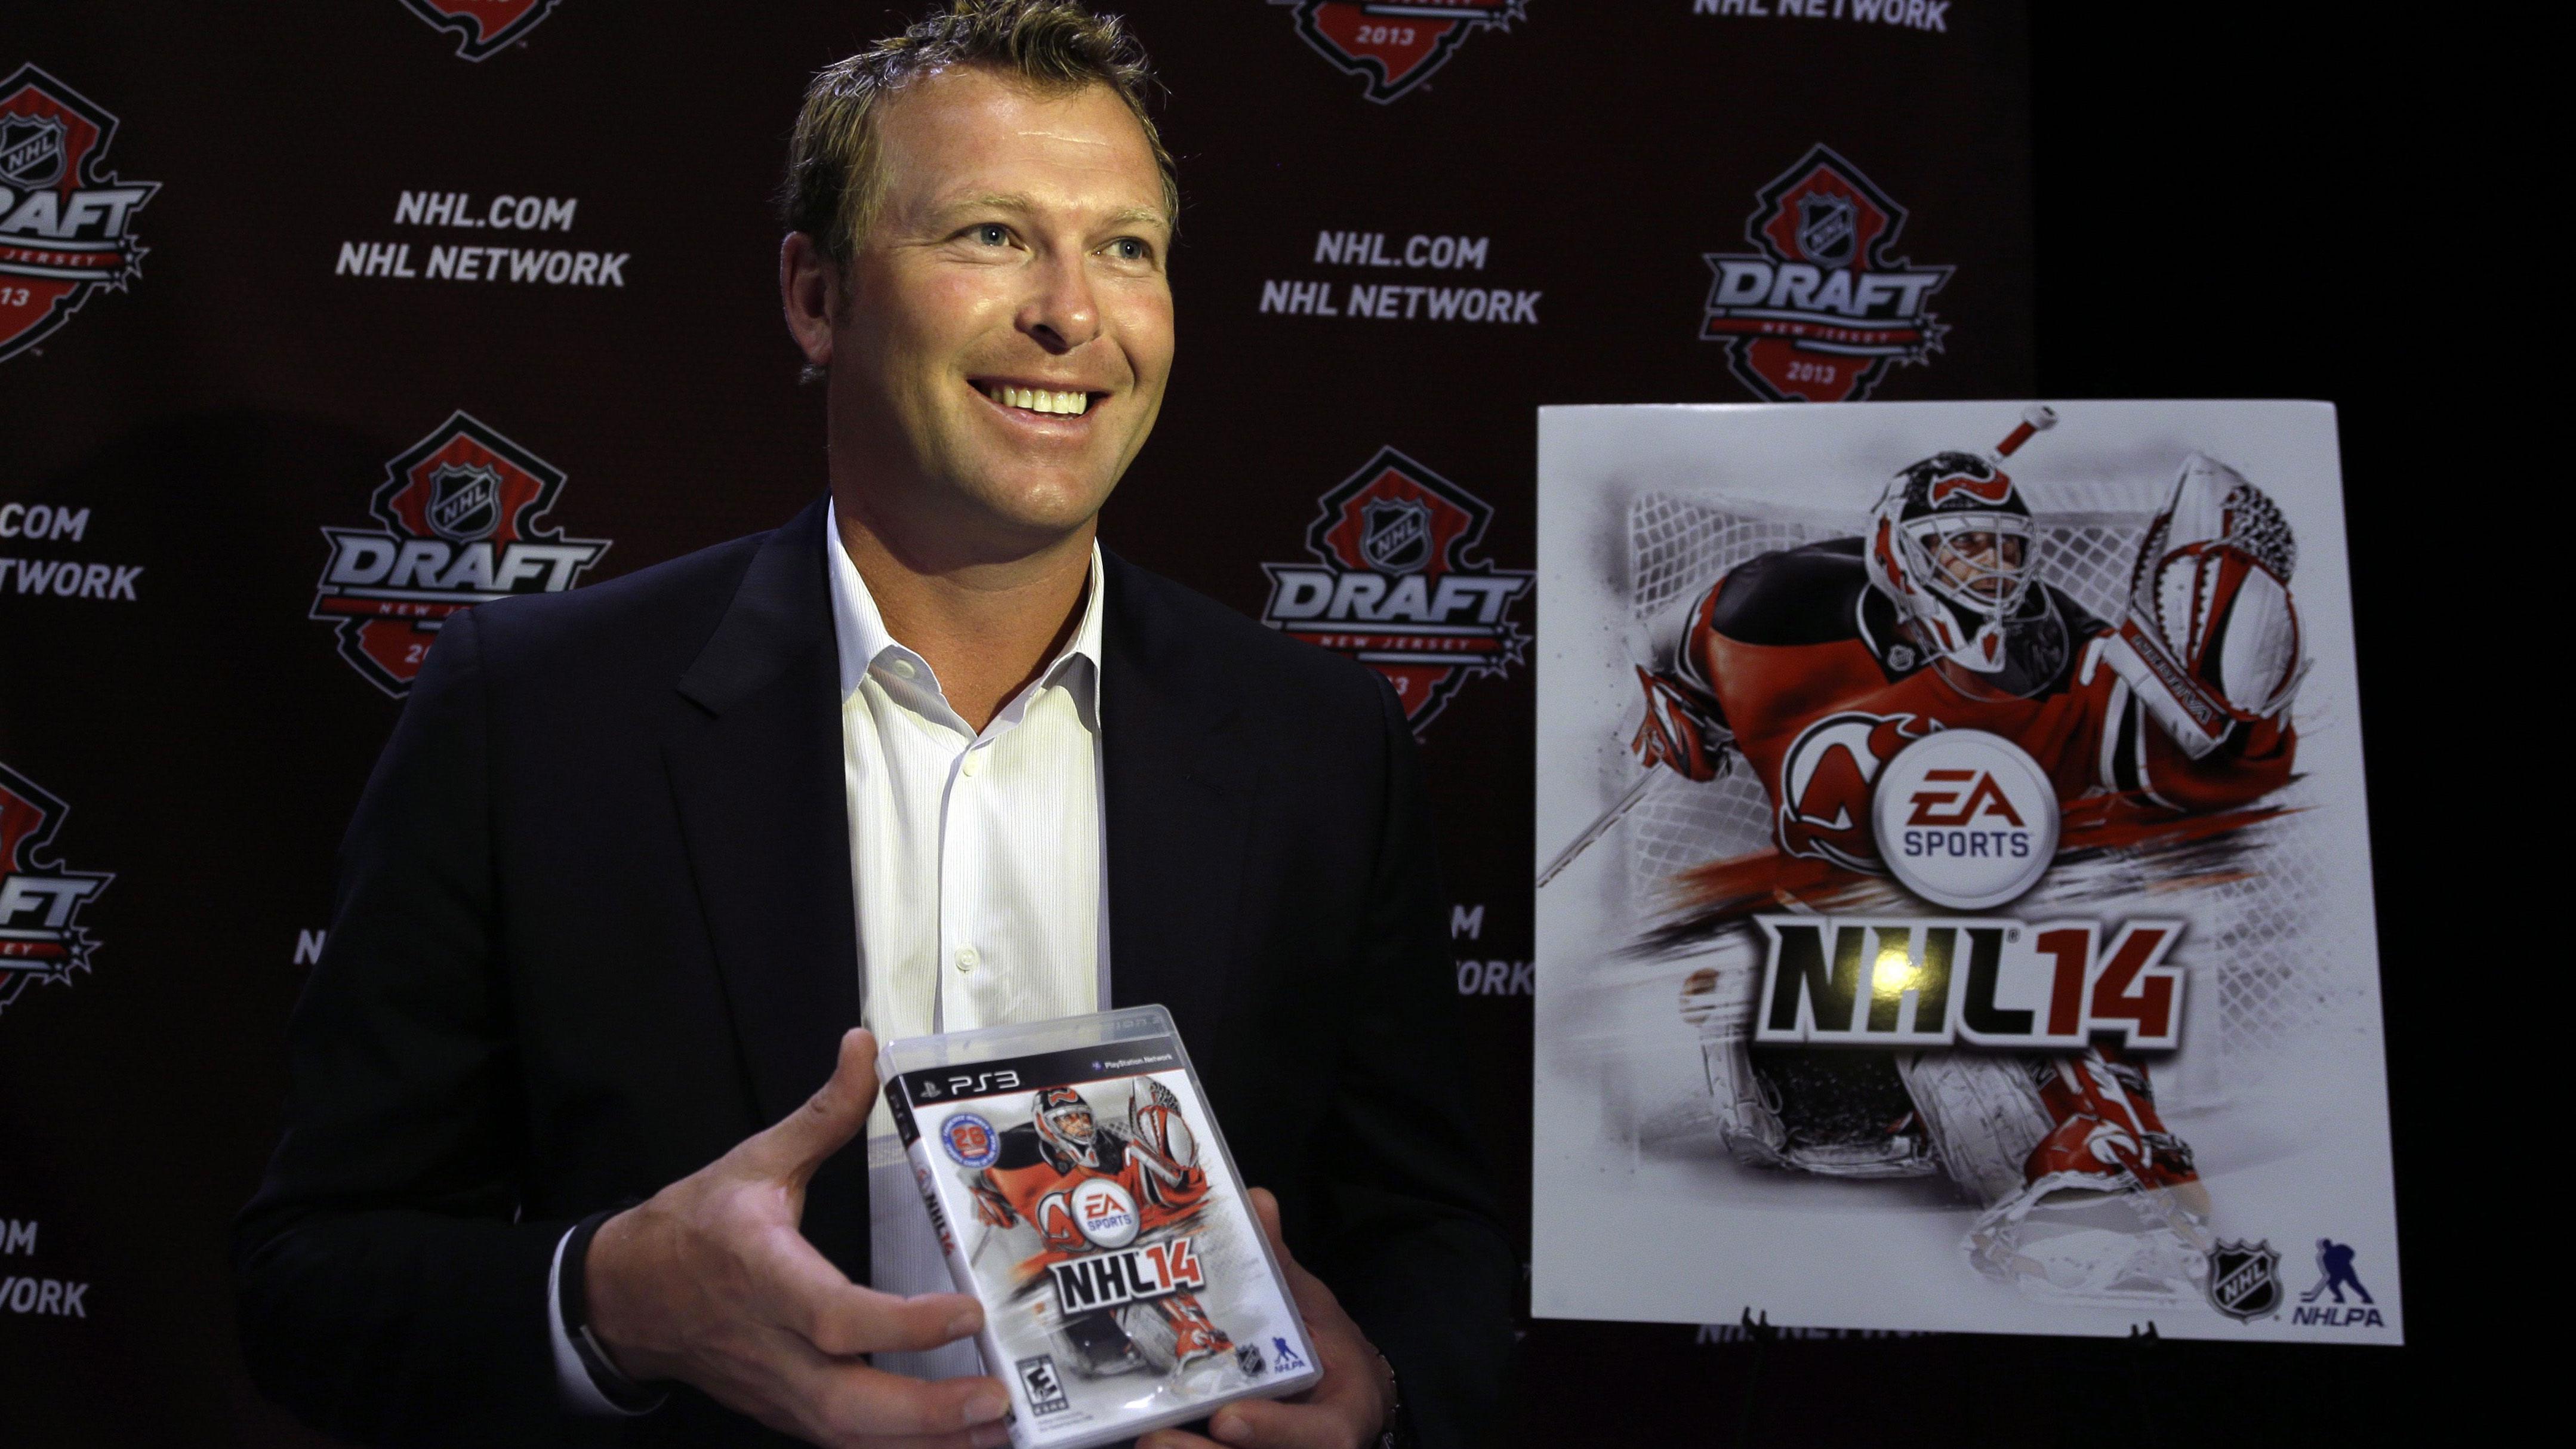 NHL 14 cover vote shows Brodeur is still a name. New Jersey Devils goalie  Martin ... de8142d70